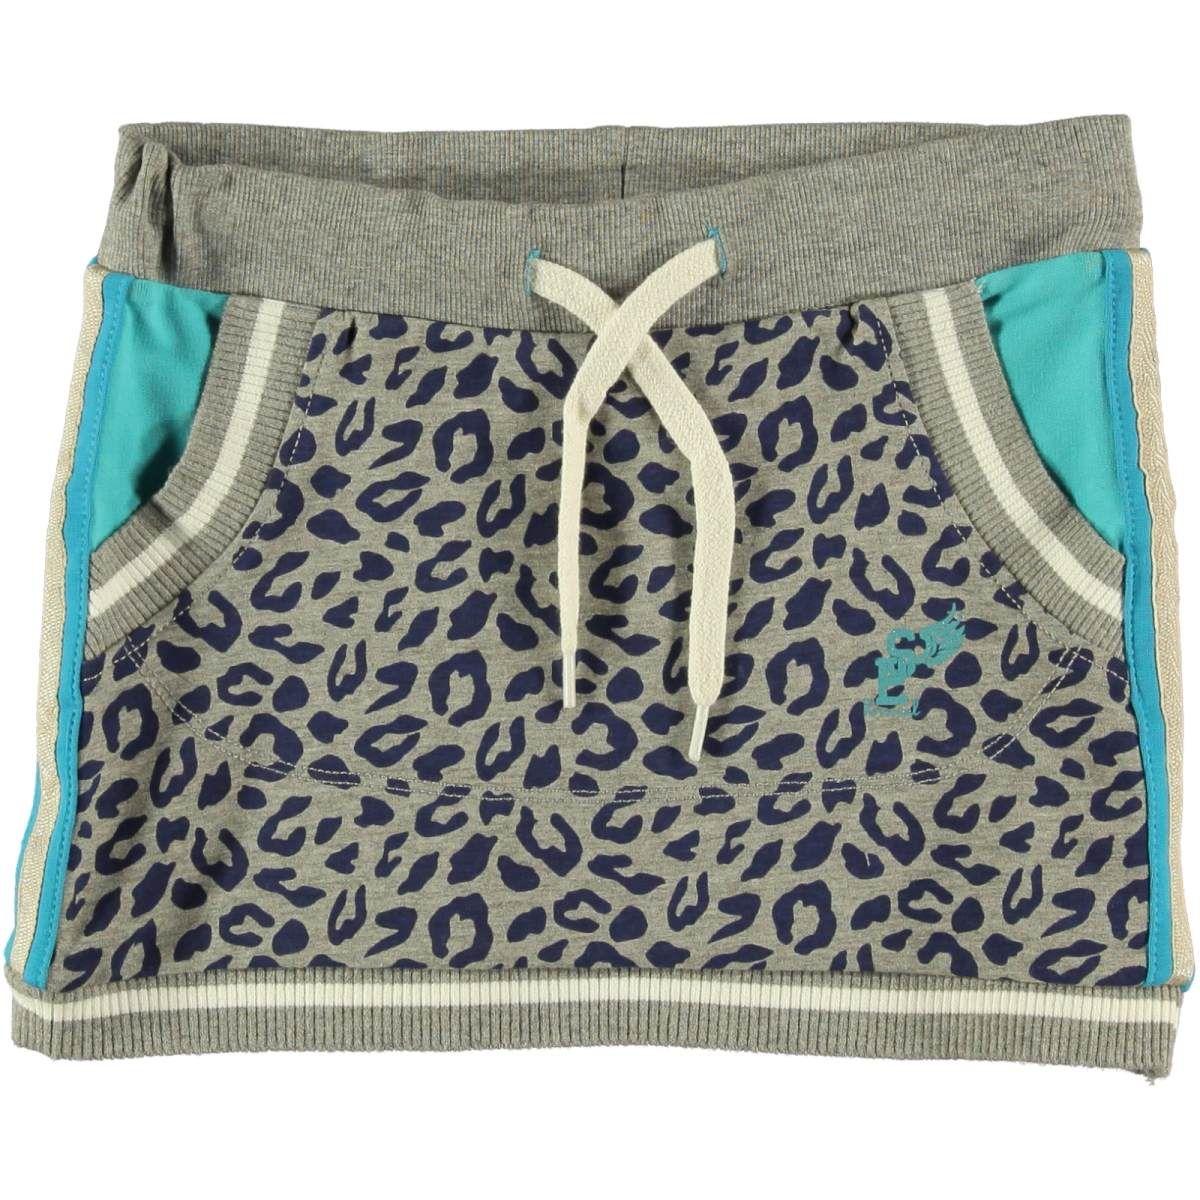 Persival Kinderkleding.Persival 5210806sp Meisjes Rok Petrol 12 99 Voordelig Online